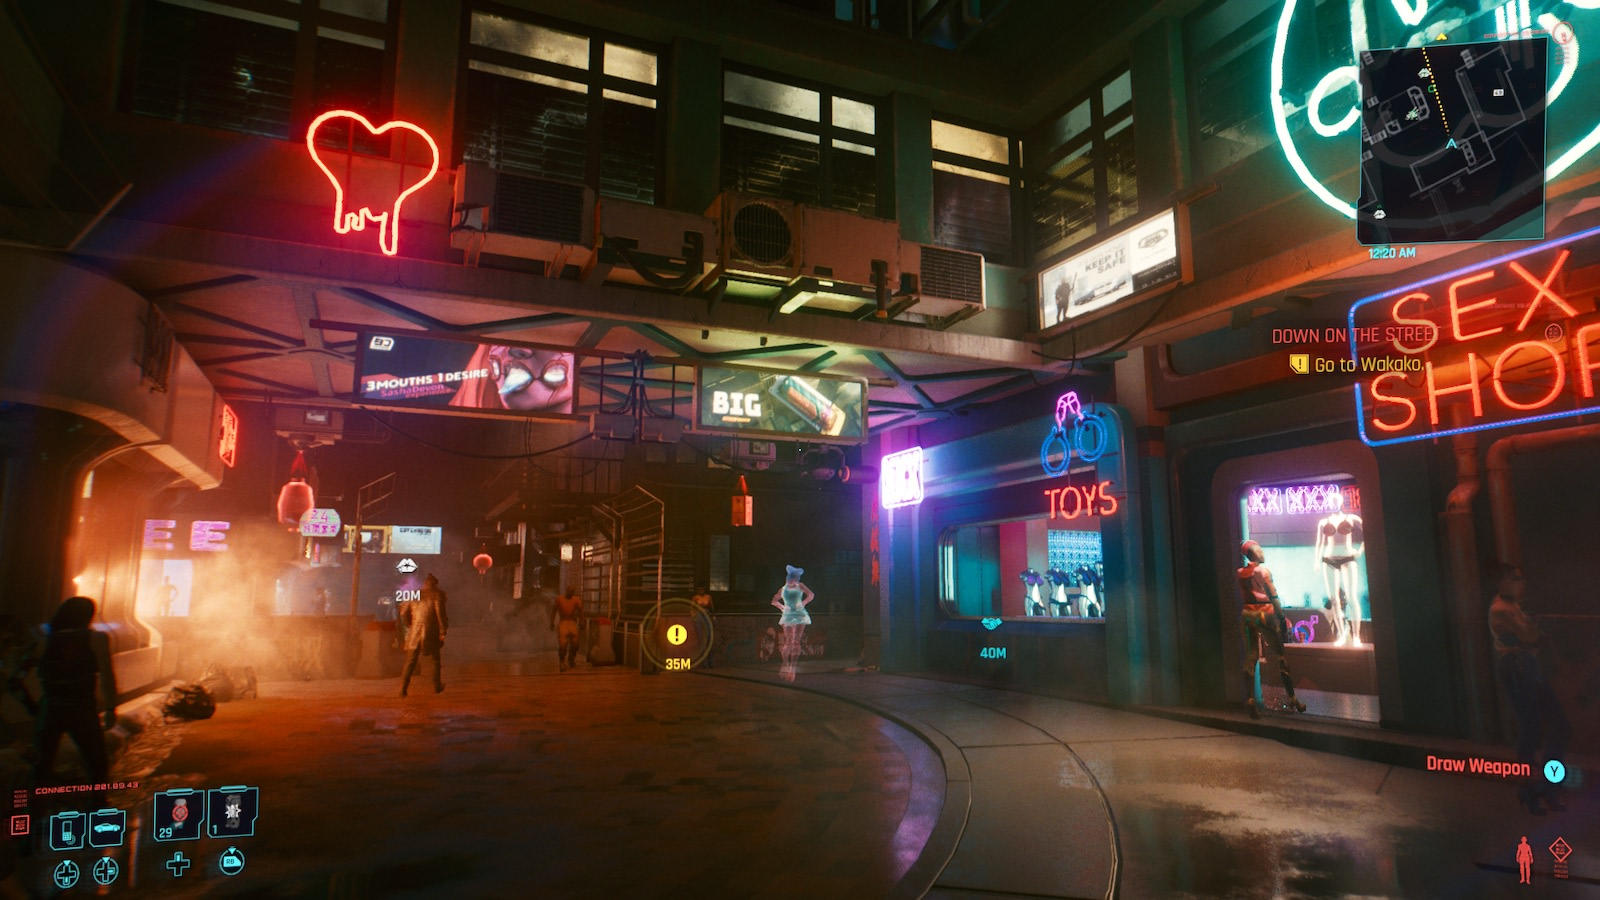 Cyberpunk 2077' is worth the wait | Engadget